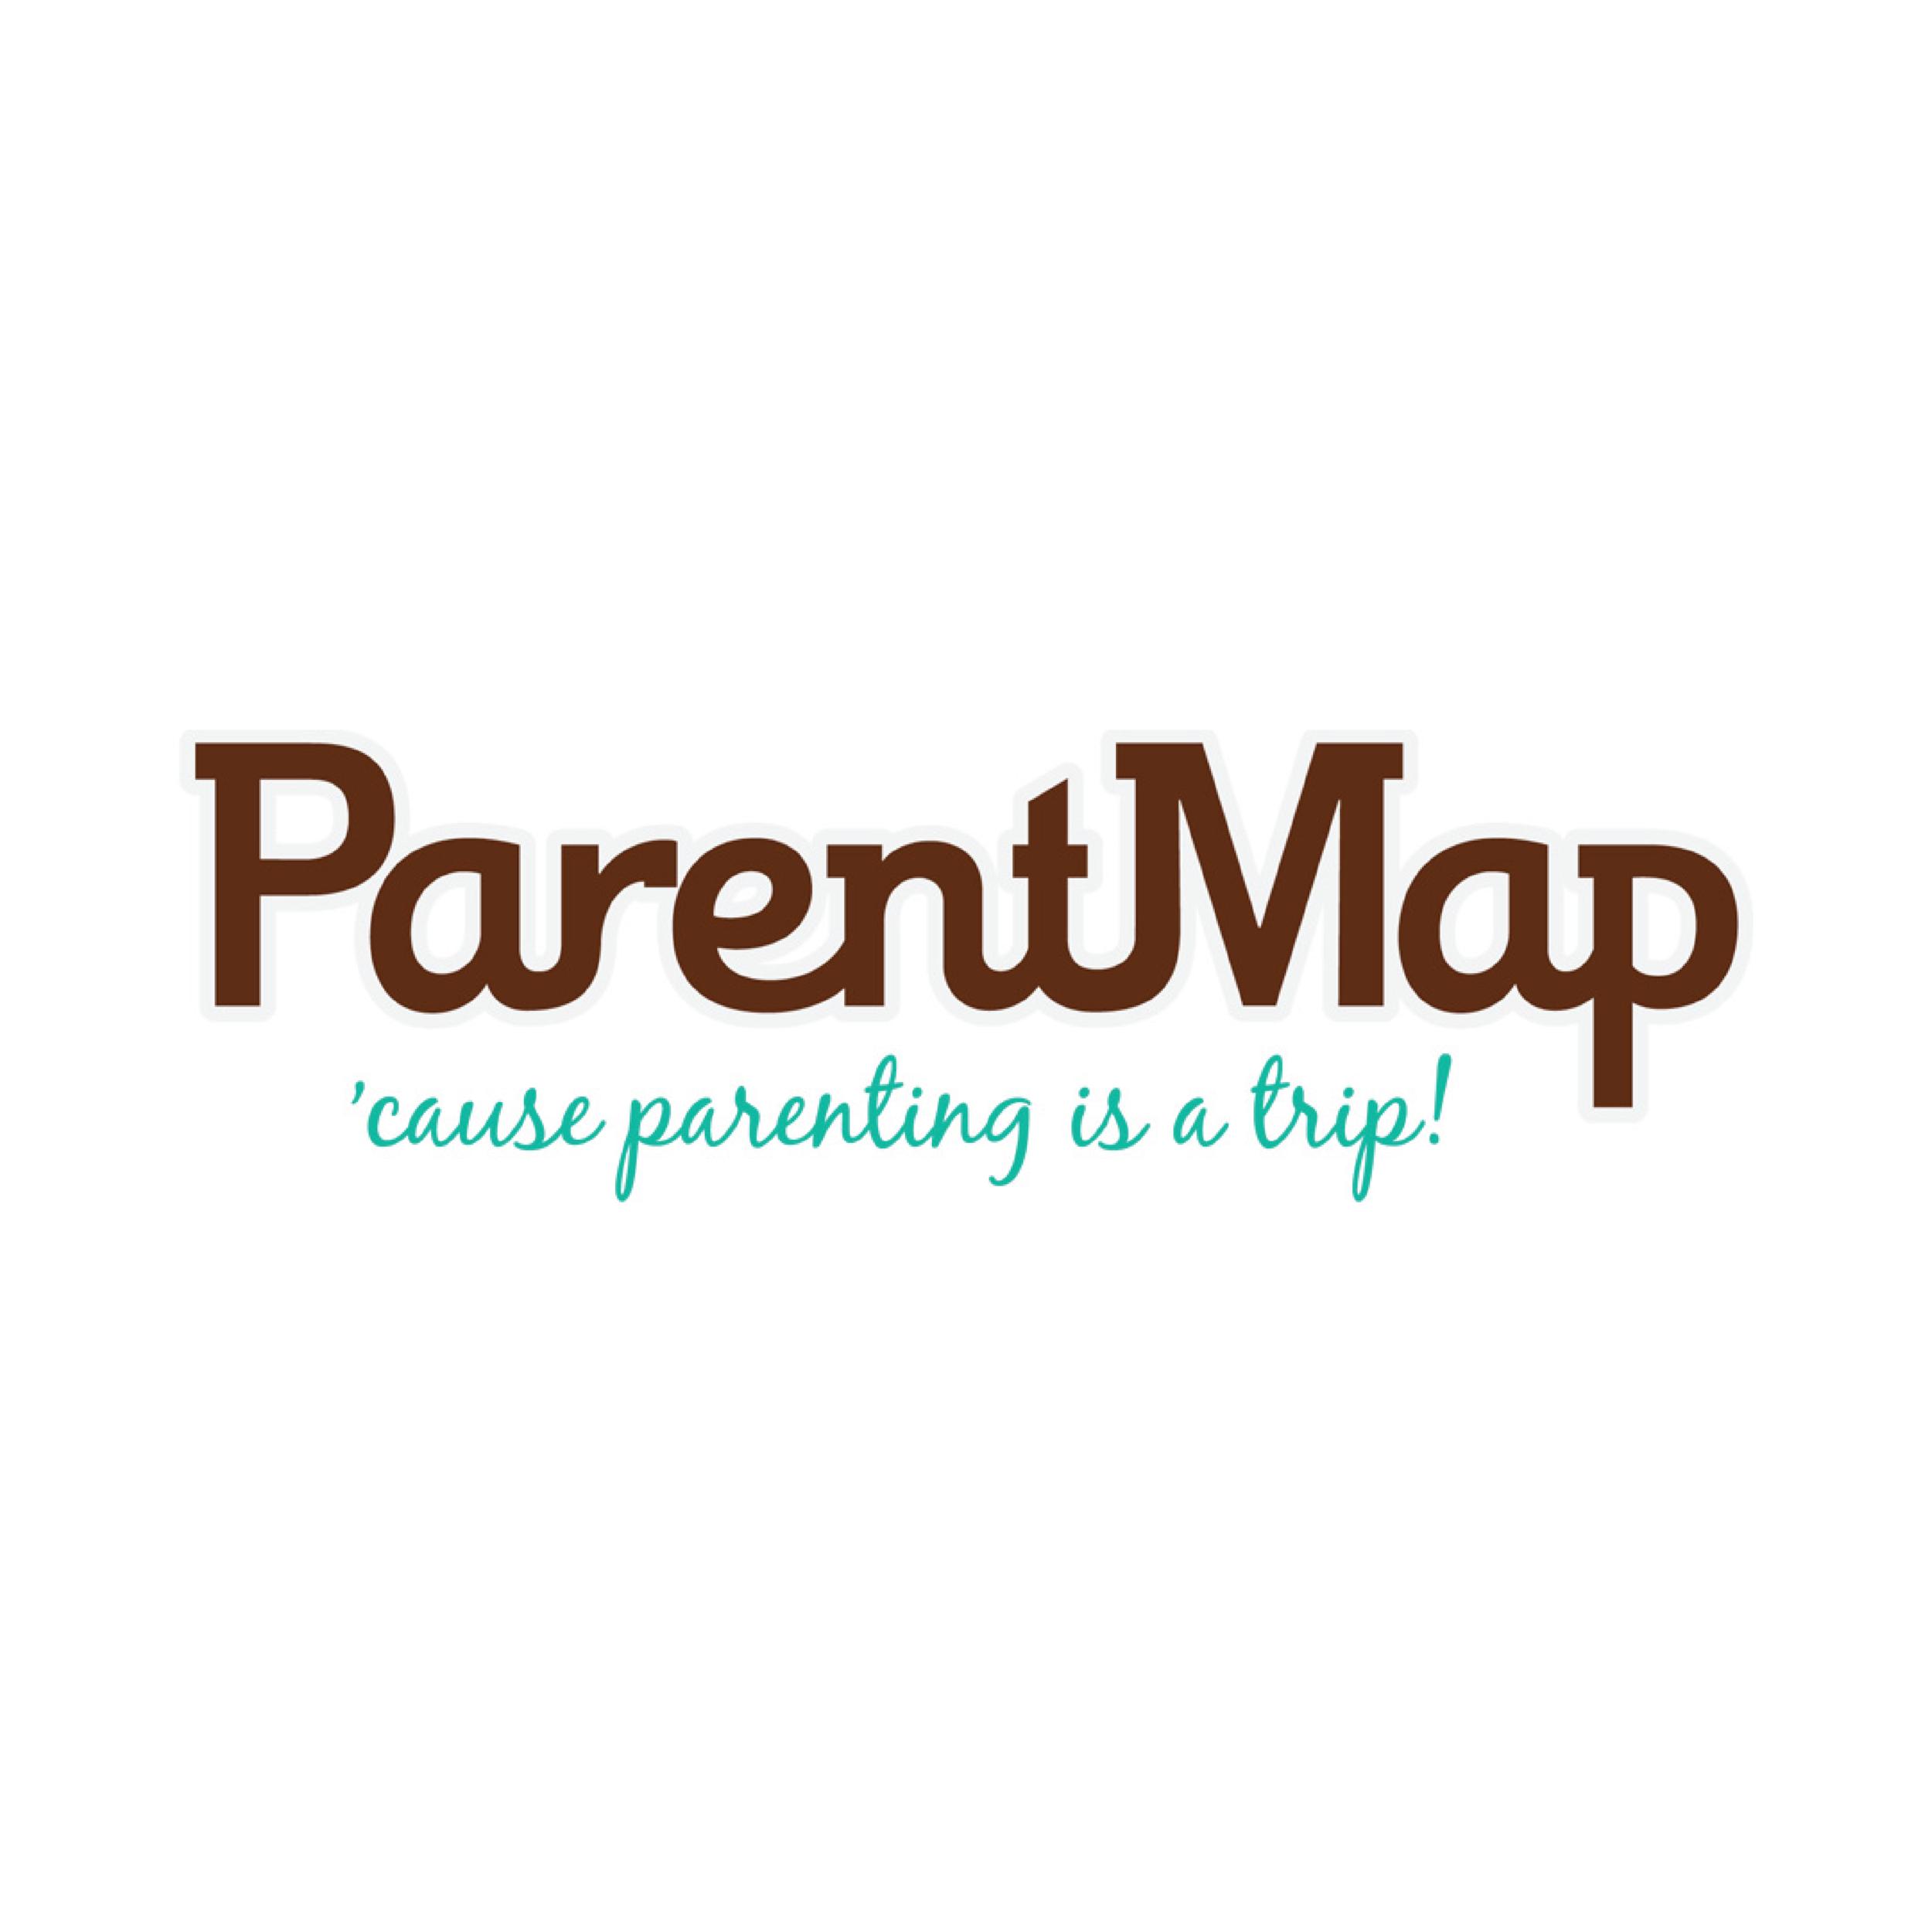 parent map.png